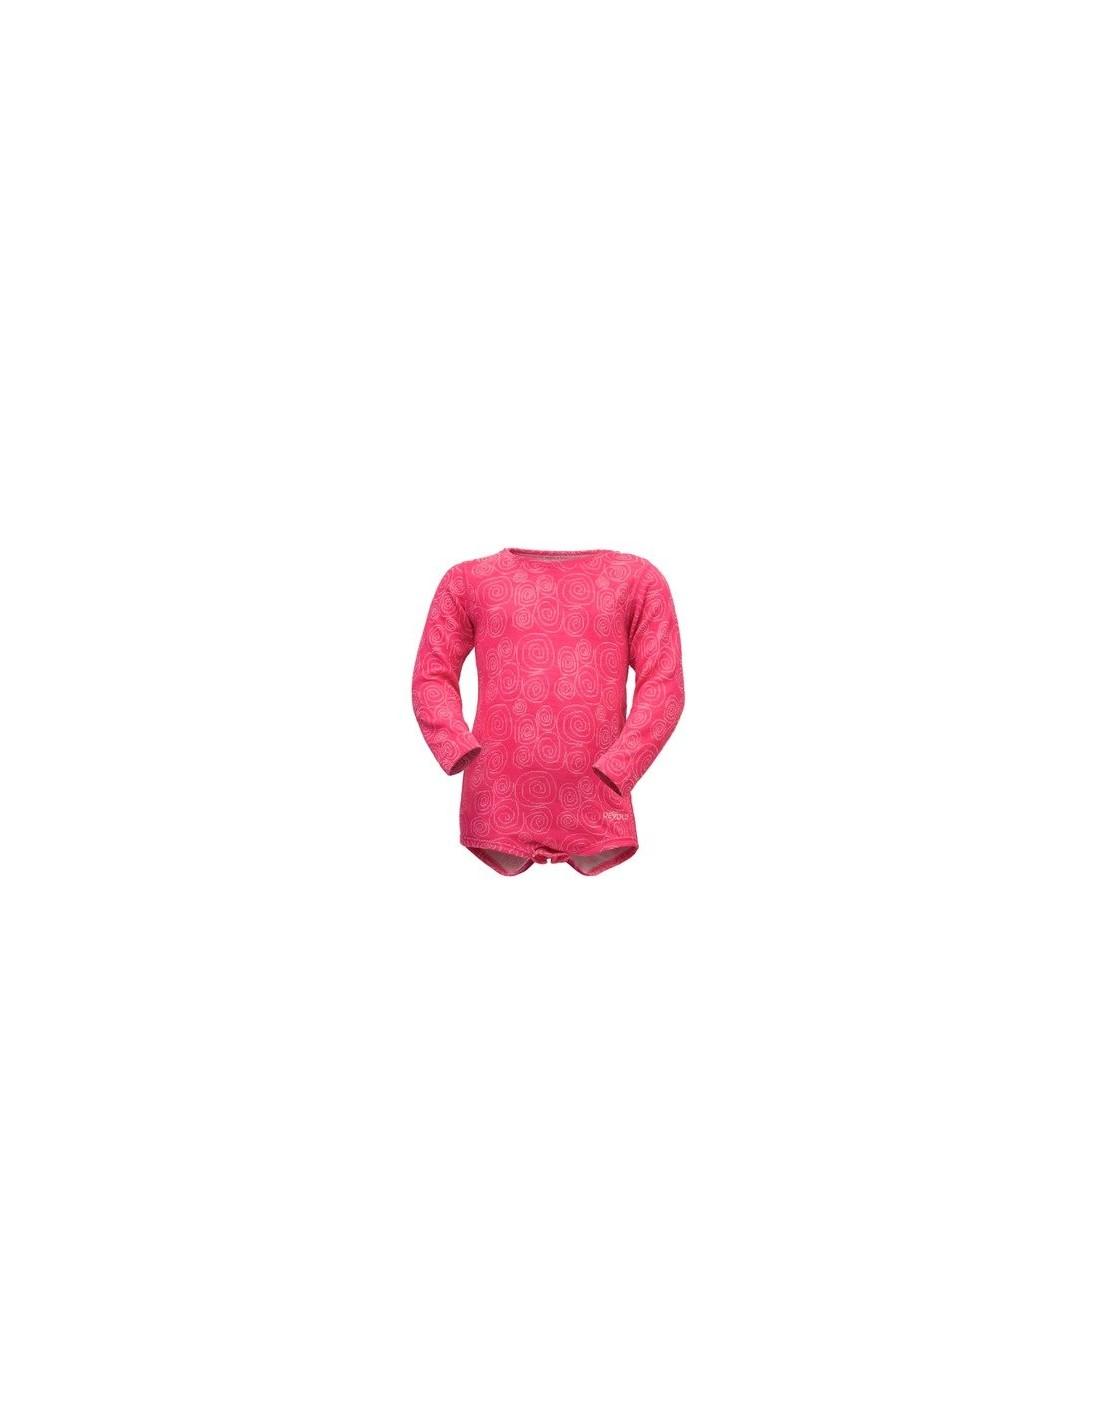 Undertøy Barn Devold Active Body Kid GO 233 270 A 299 kr